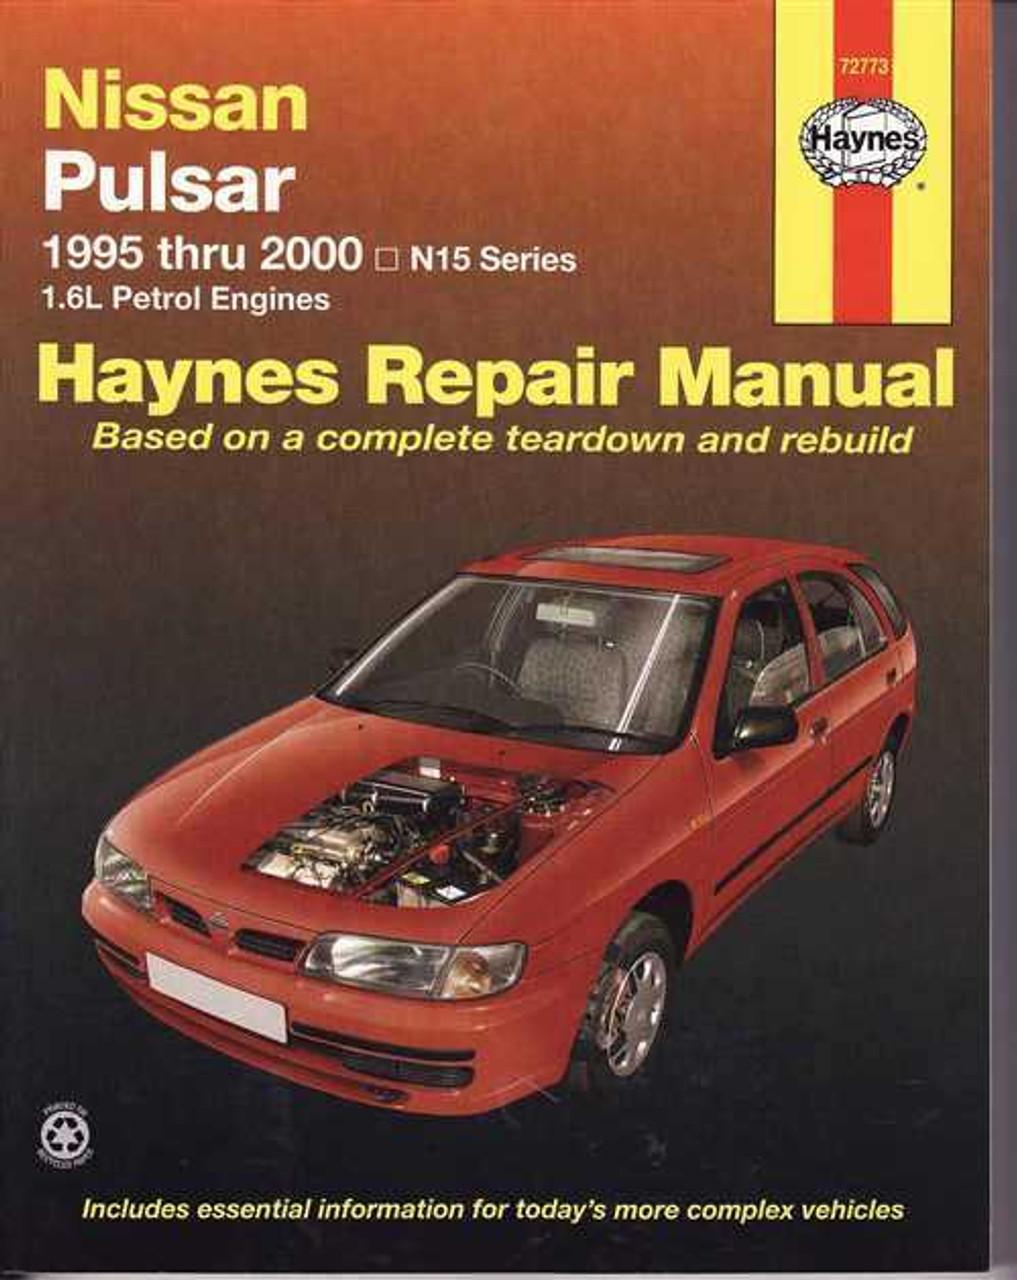 nissan pulsar 1986 1995 factory service repair manual pdf